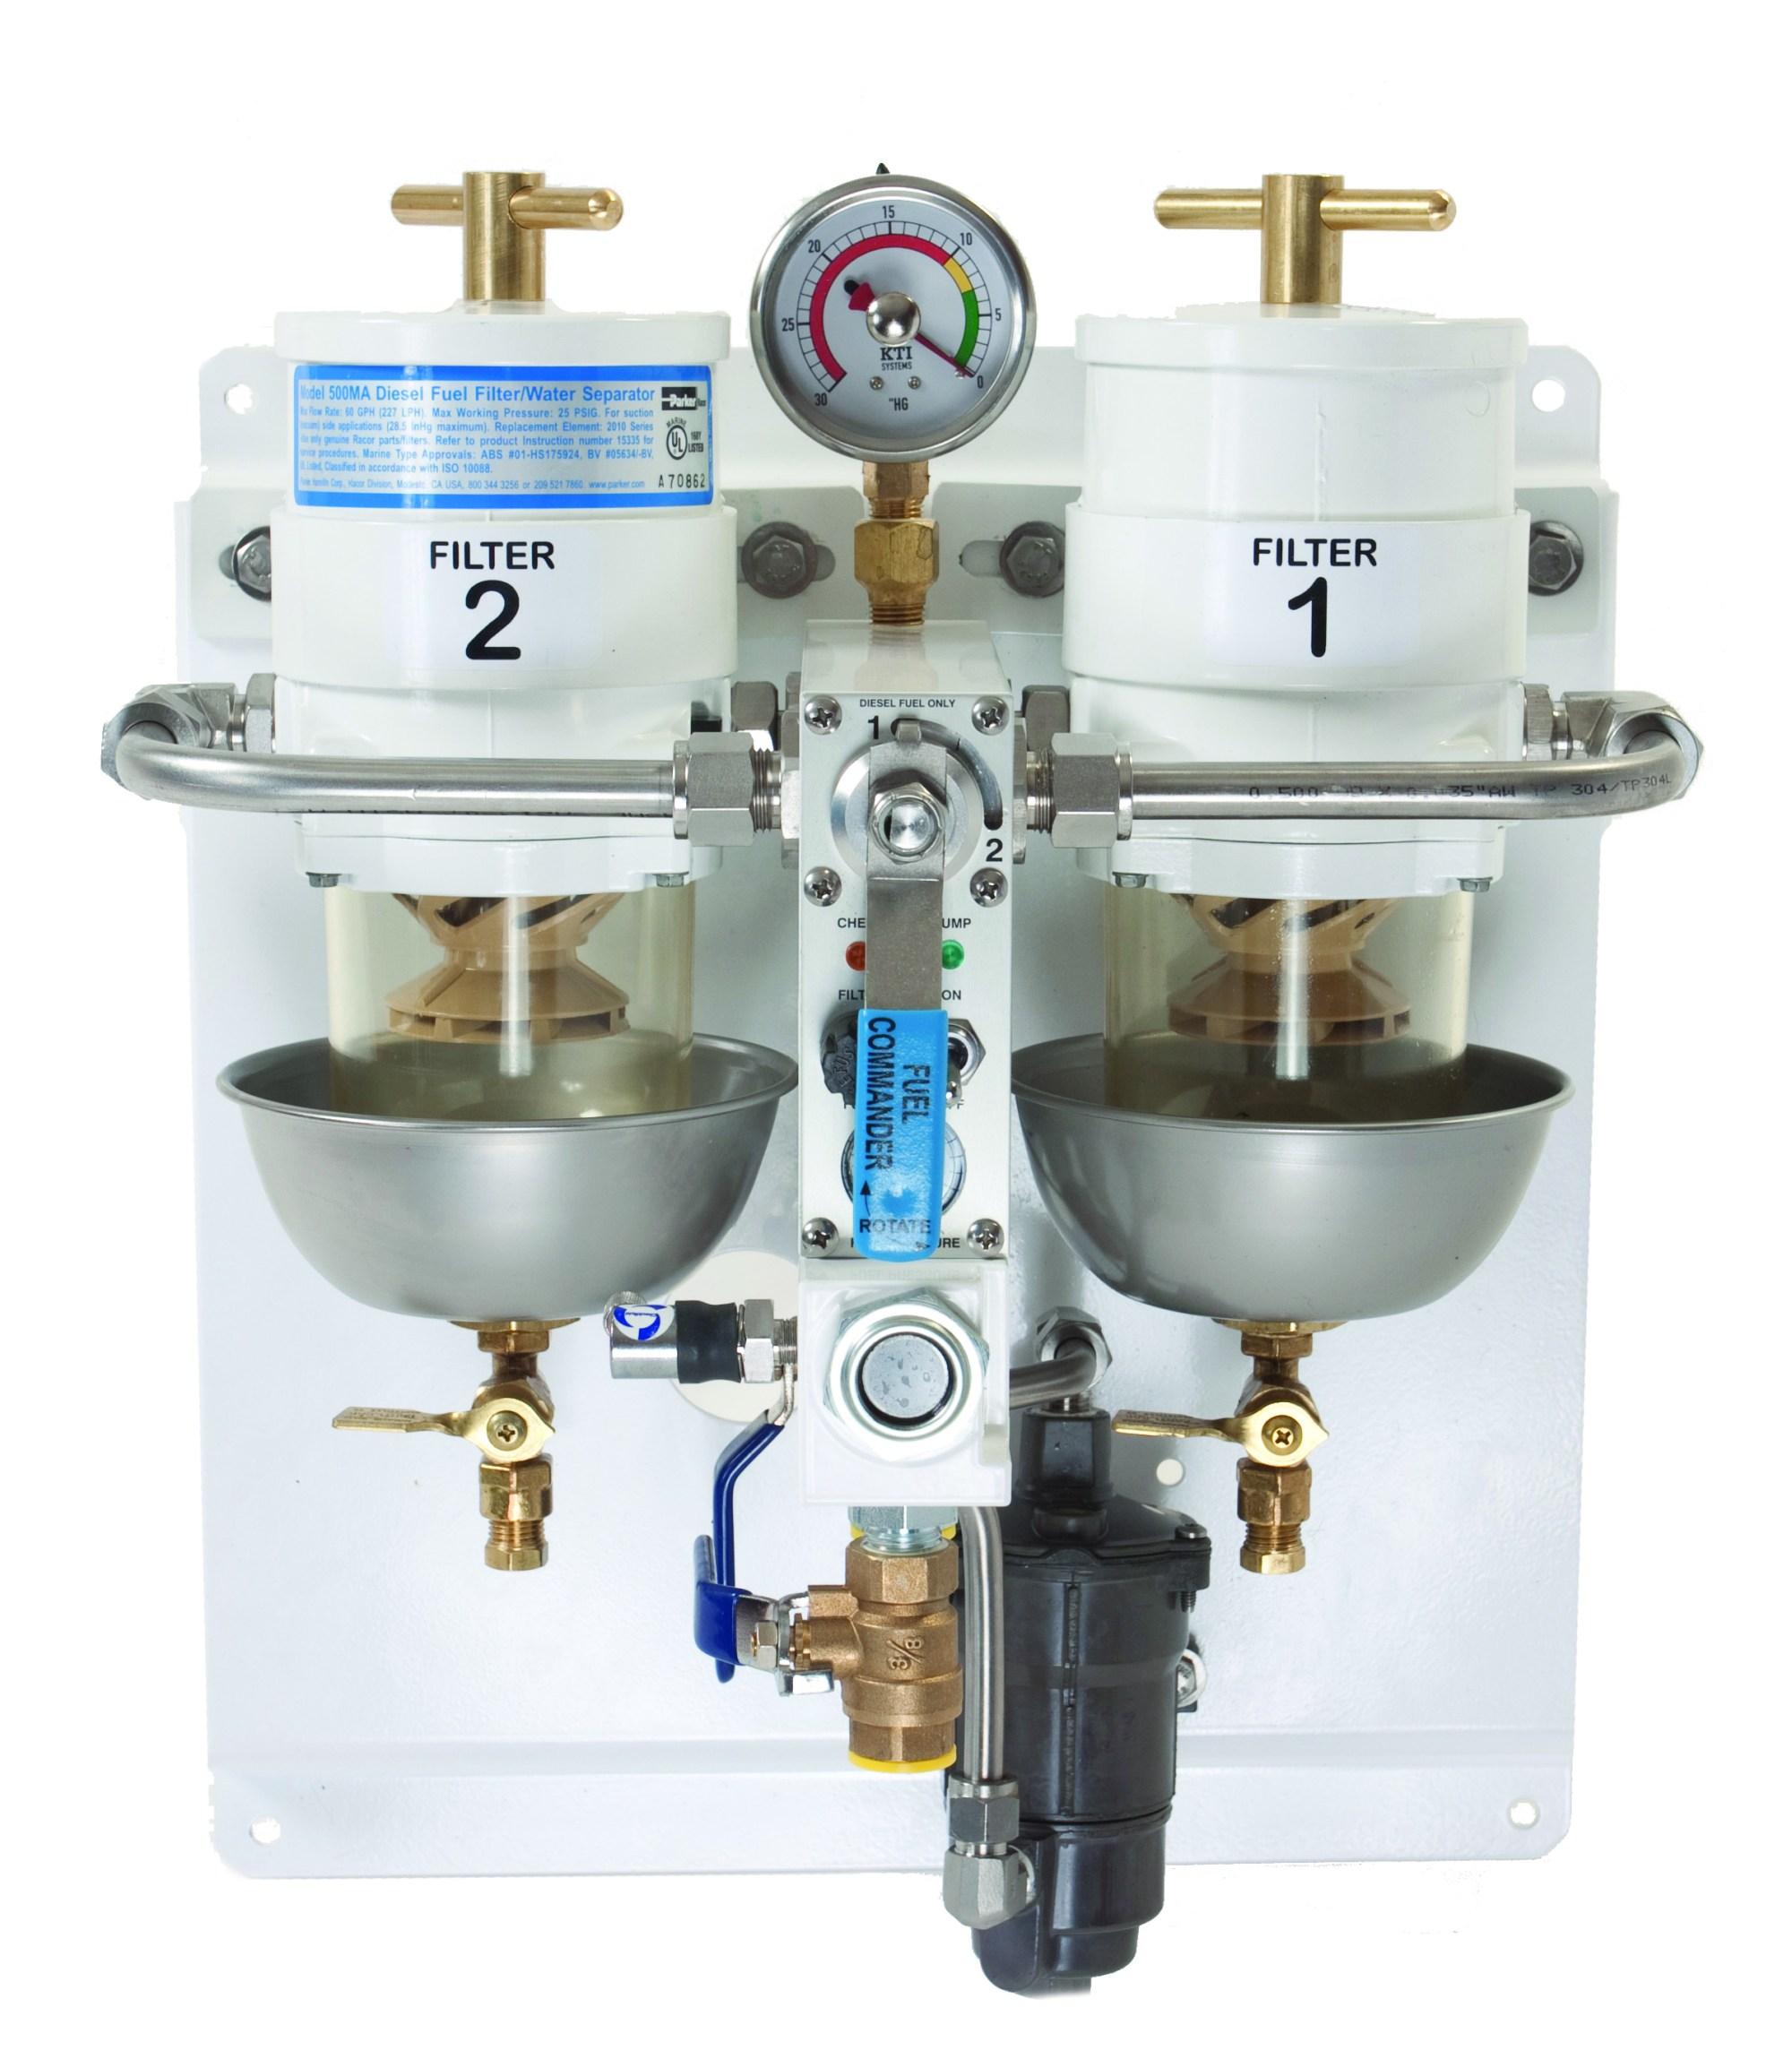 hight resolution of dual racor fuel filter from defender filterboss commander